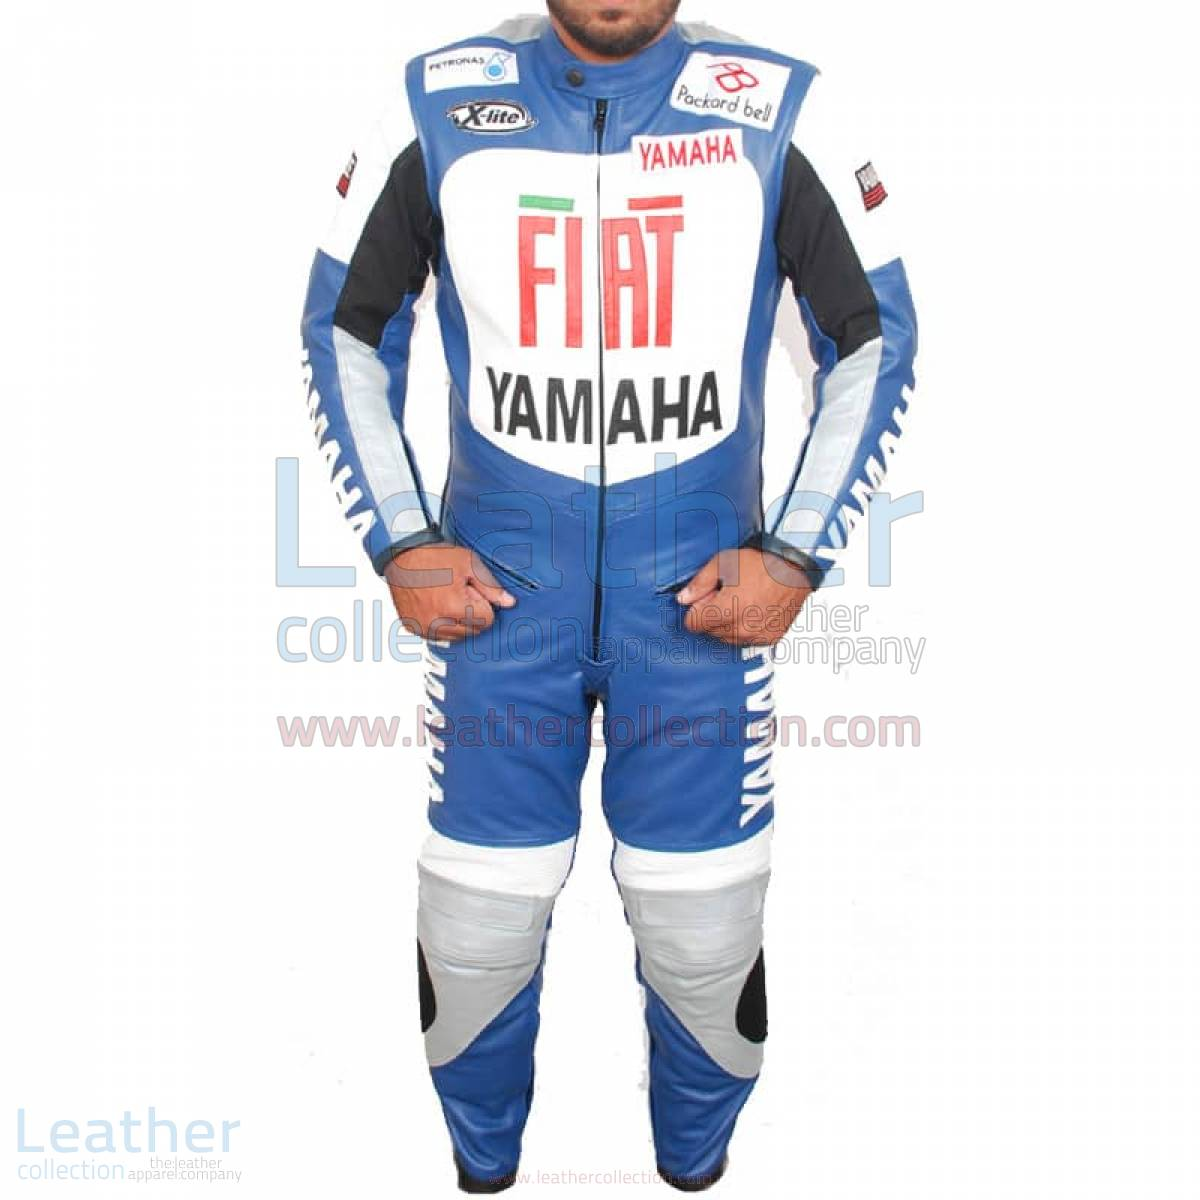 Yamaha FIAT Motorcycle Racing Leather Suit – Yamaha Suit